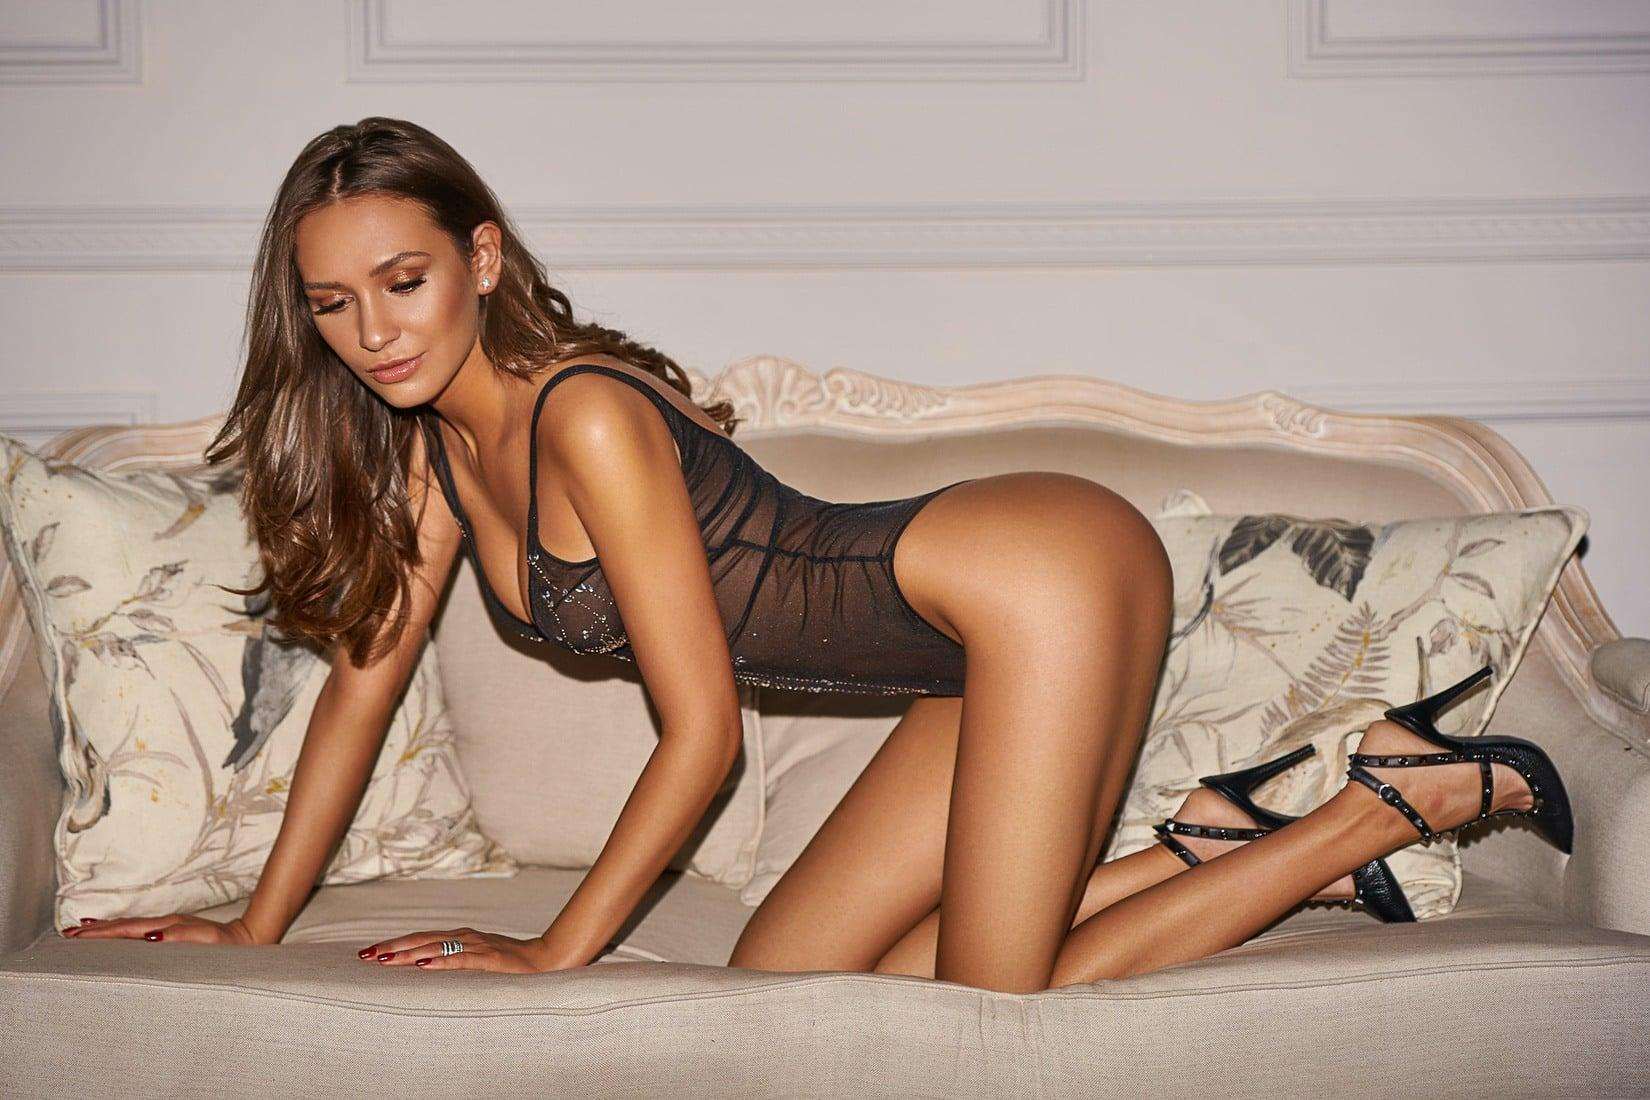 Ada from Casino London Models